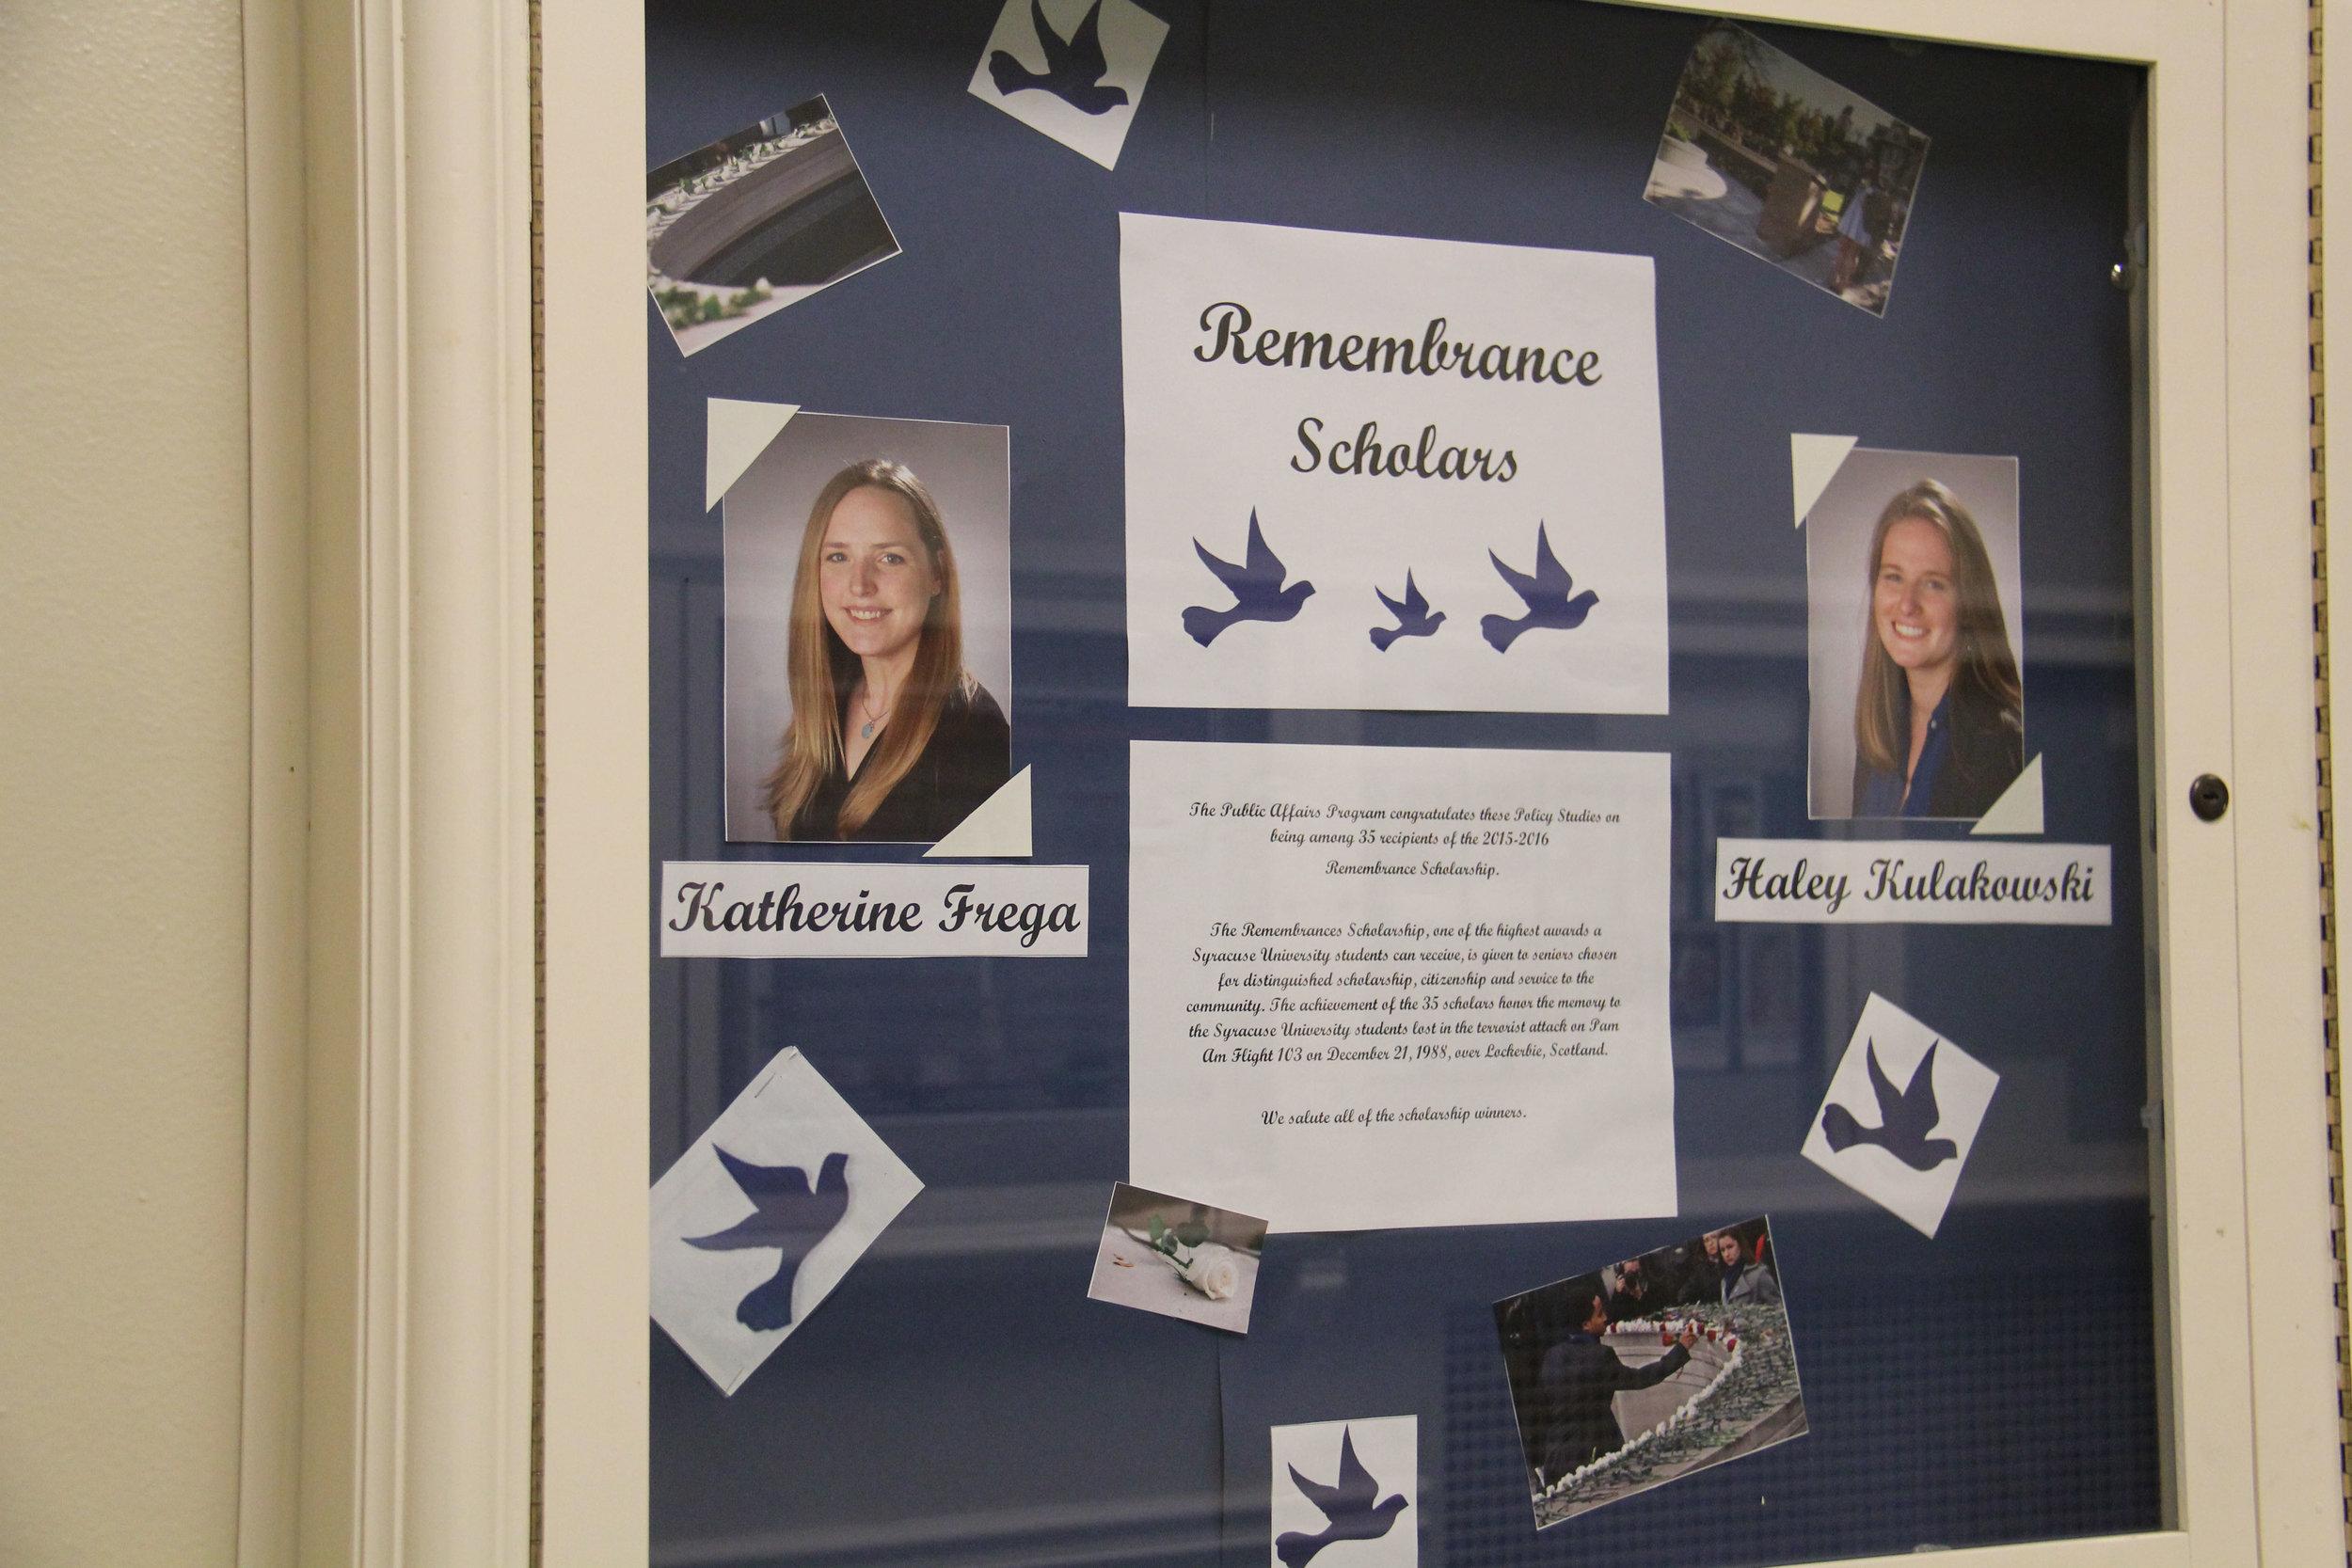 3.Rememberance